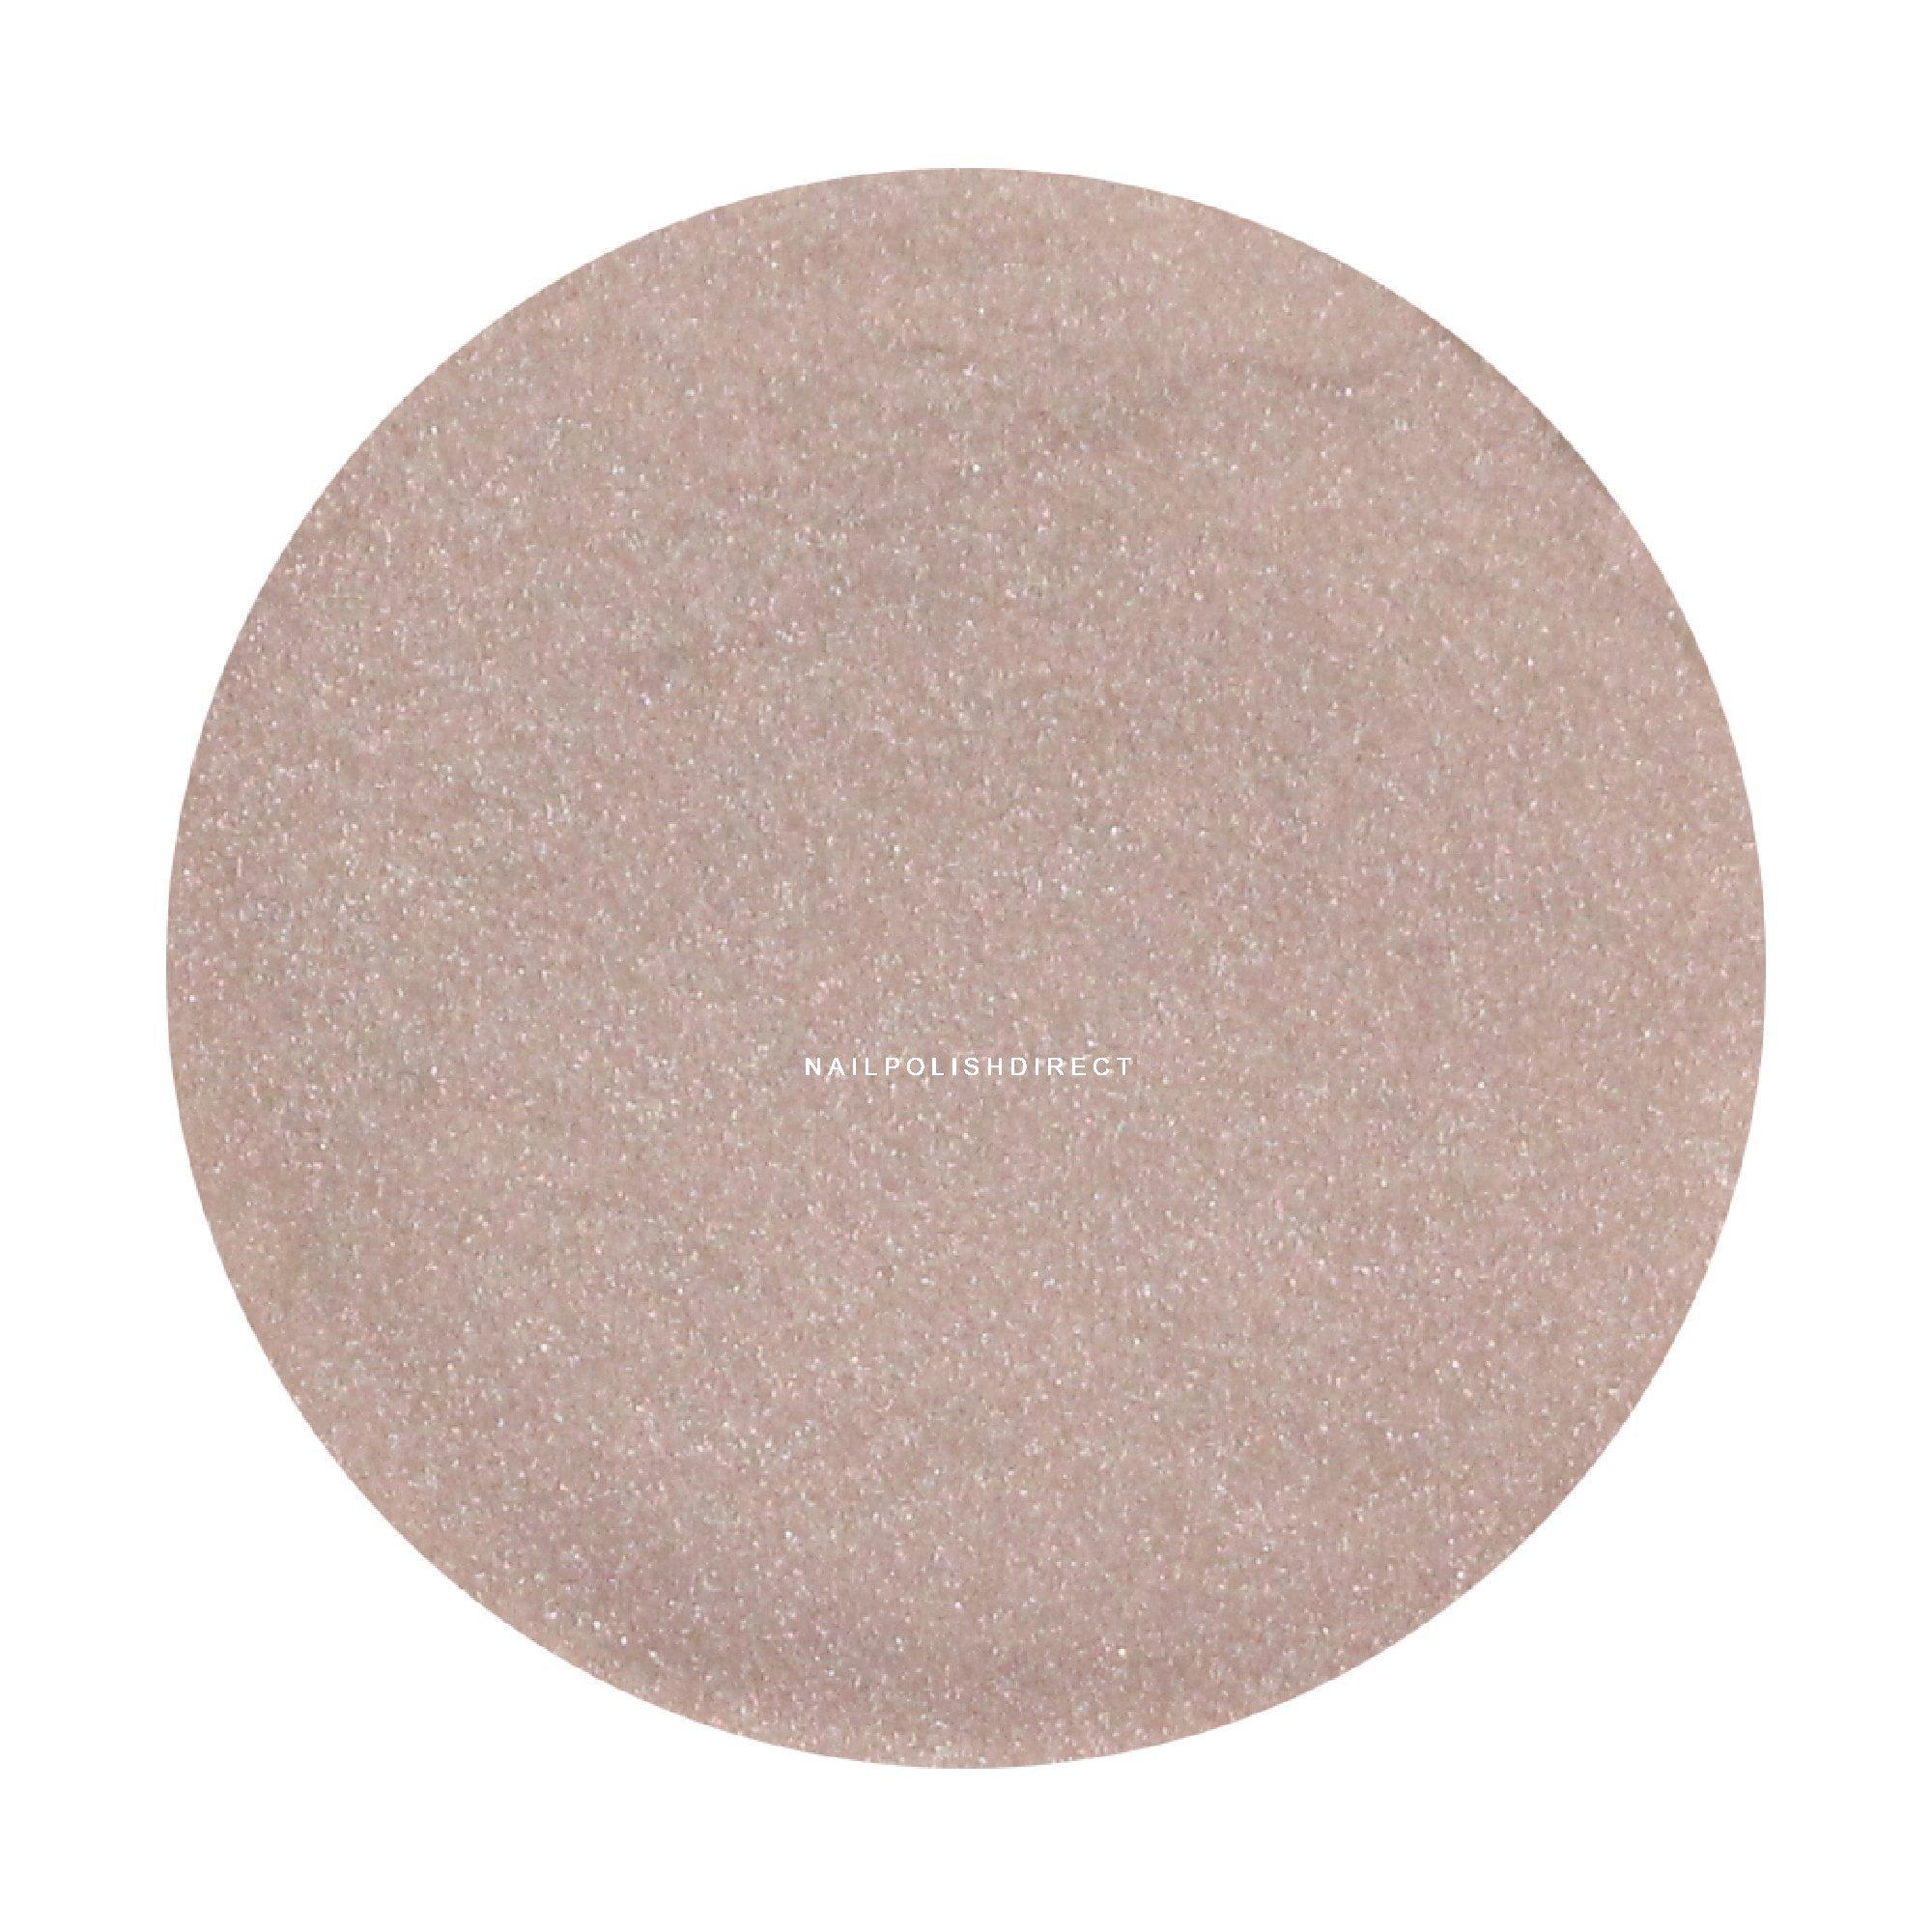 Cuccio Pro Powder Polish Dip System - Iridescent Cream 45g (5549)